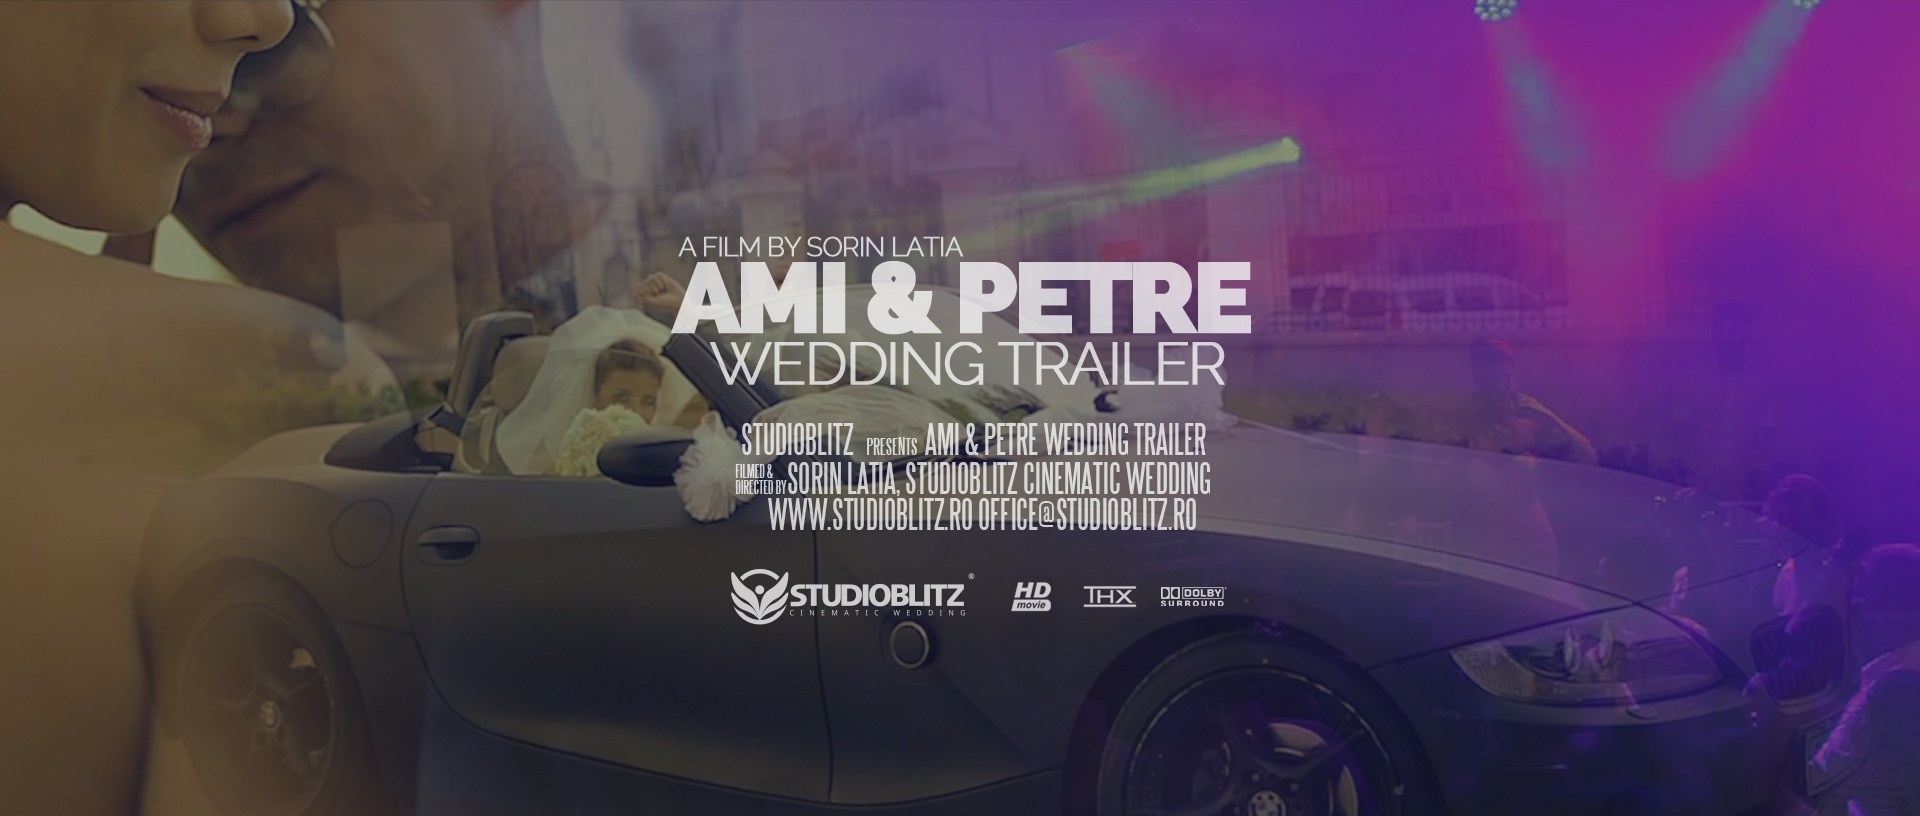 coperta-cameraman-profesionist-nunta-craiova-ami-si-petre-trailer